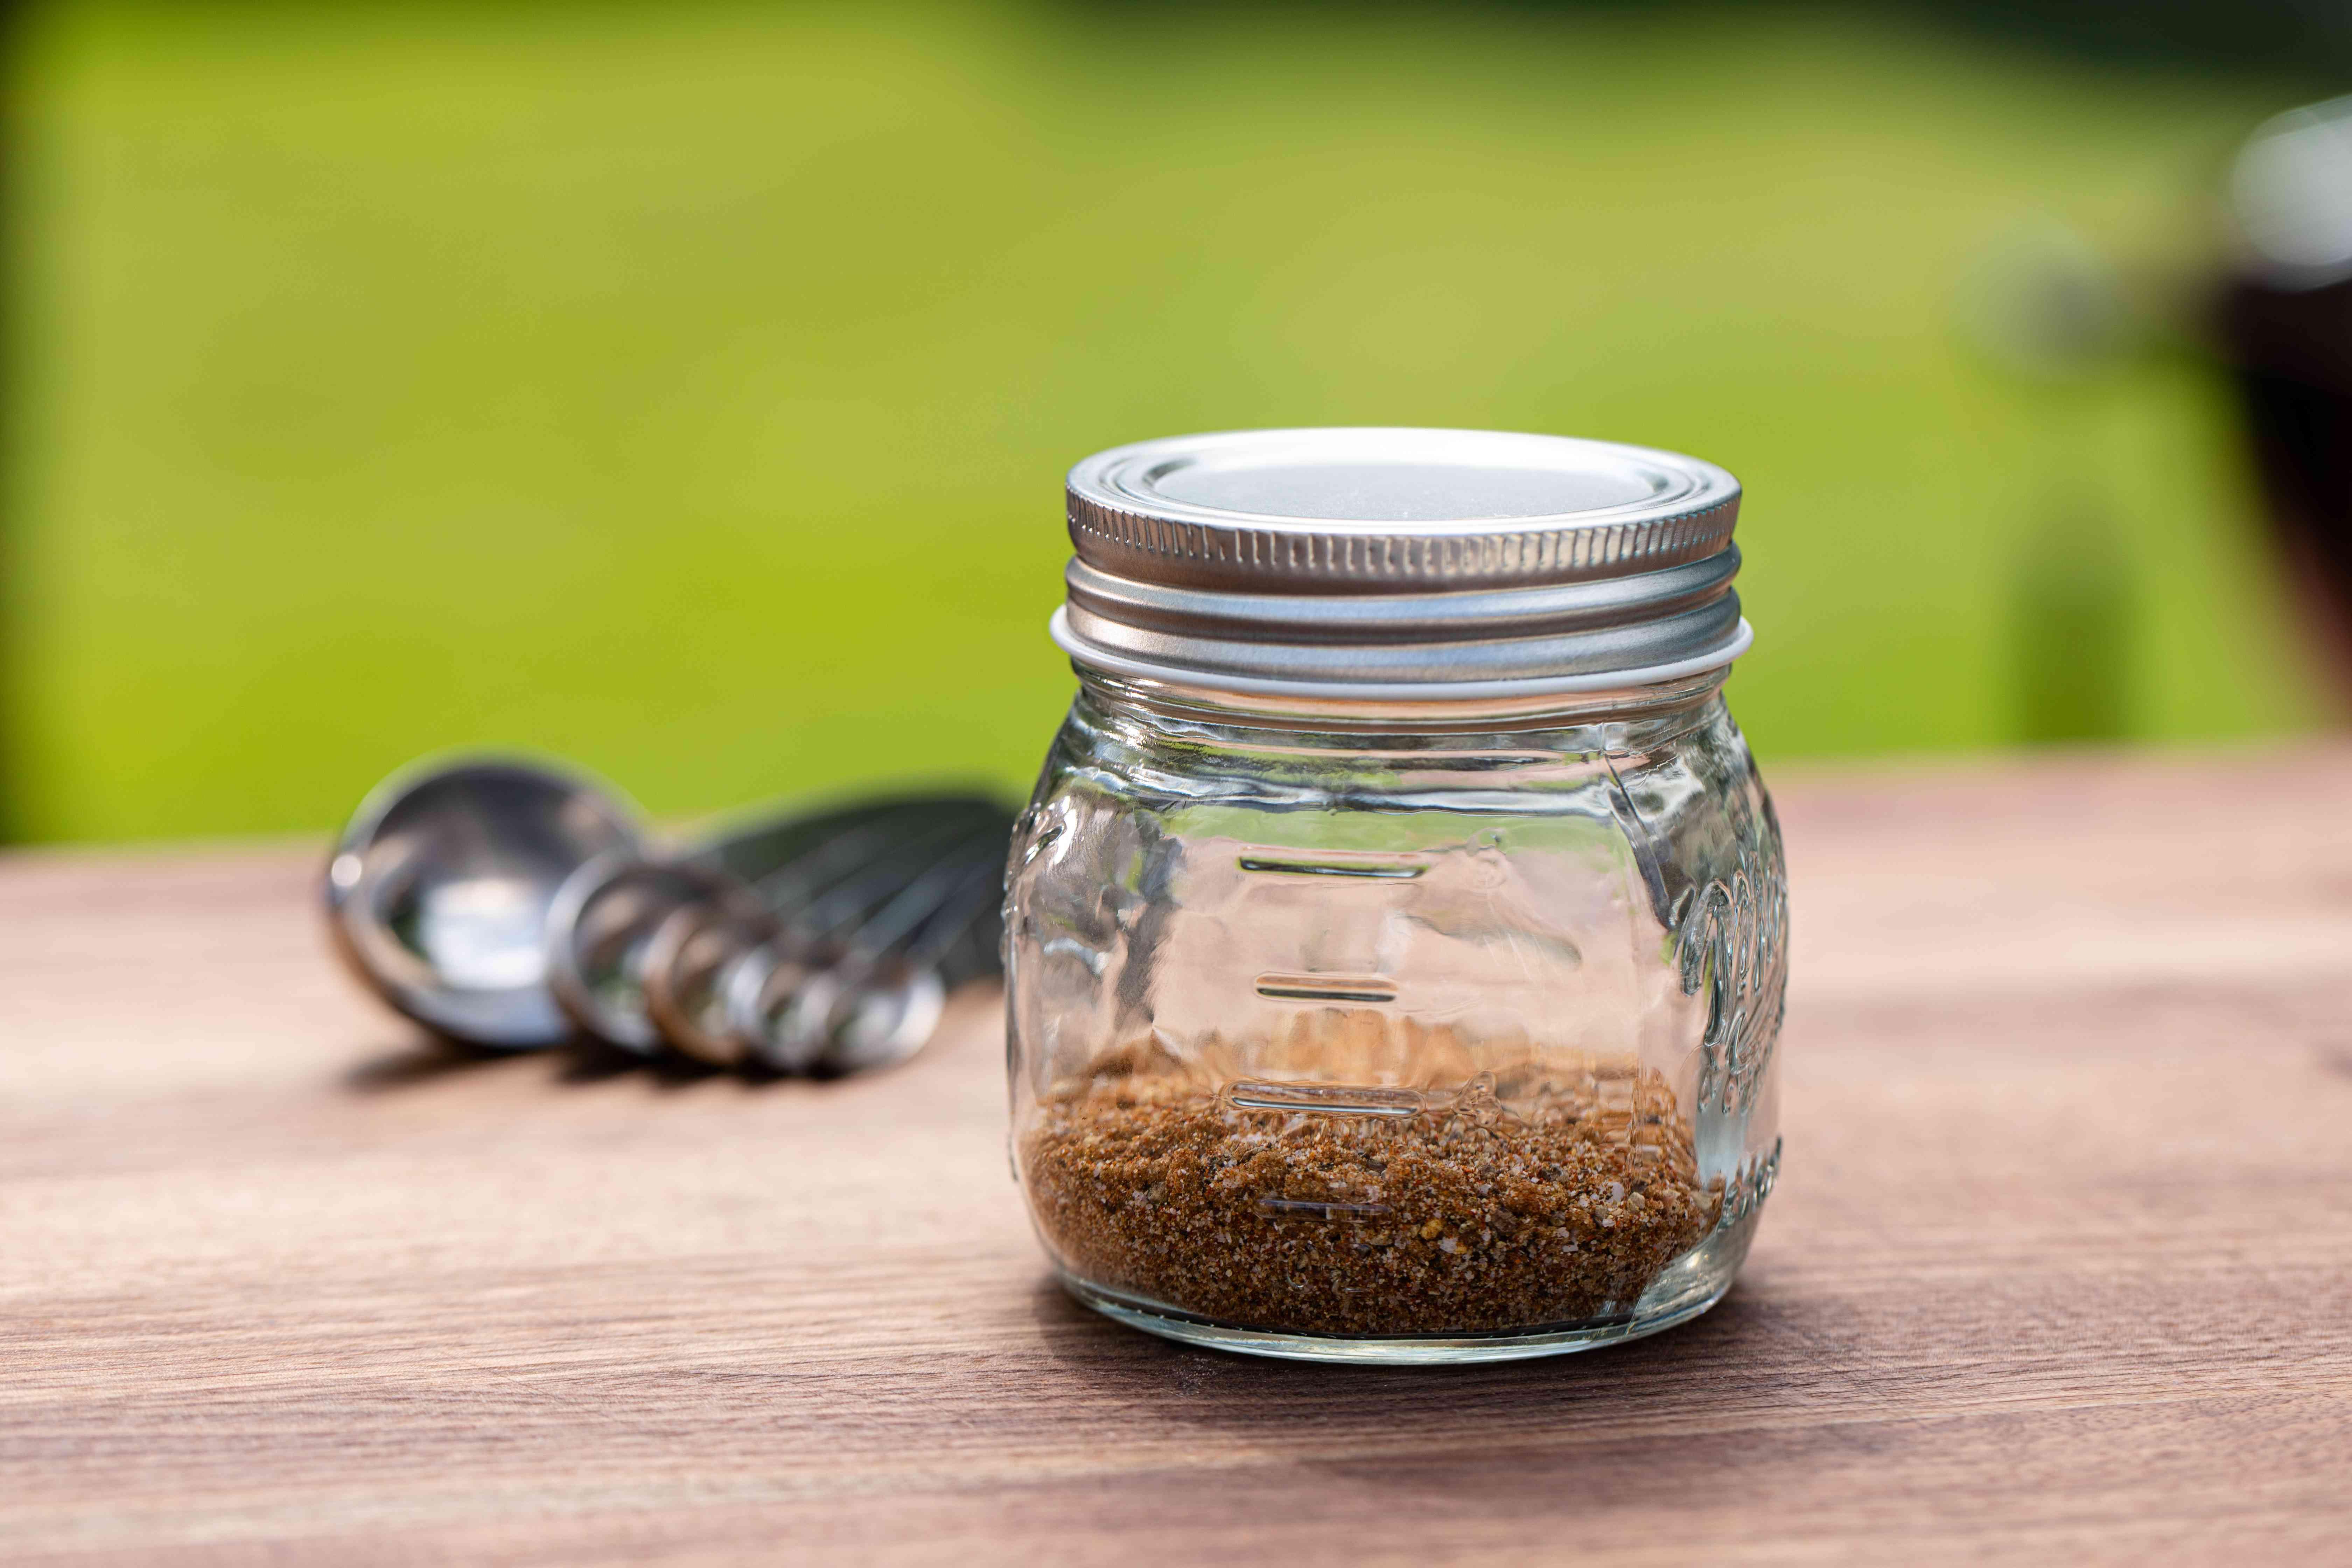 Hamburger Seasoning outside in a glass jar.